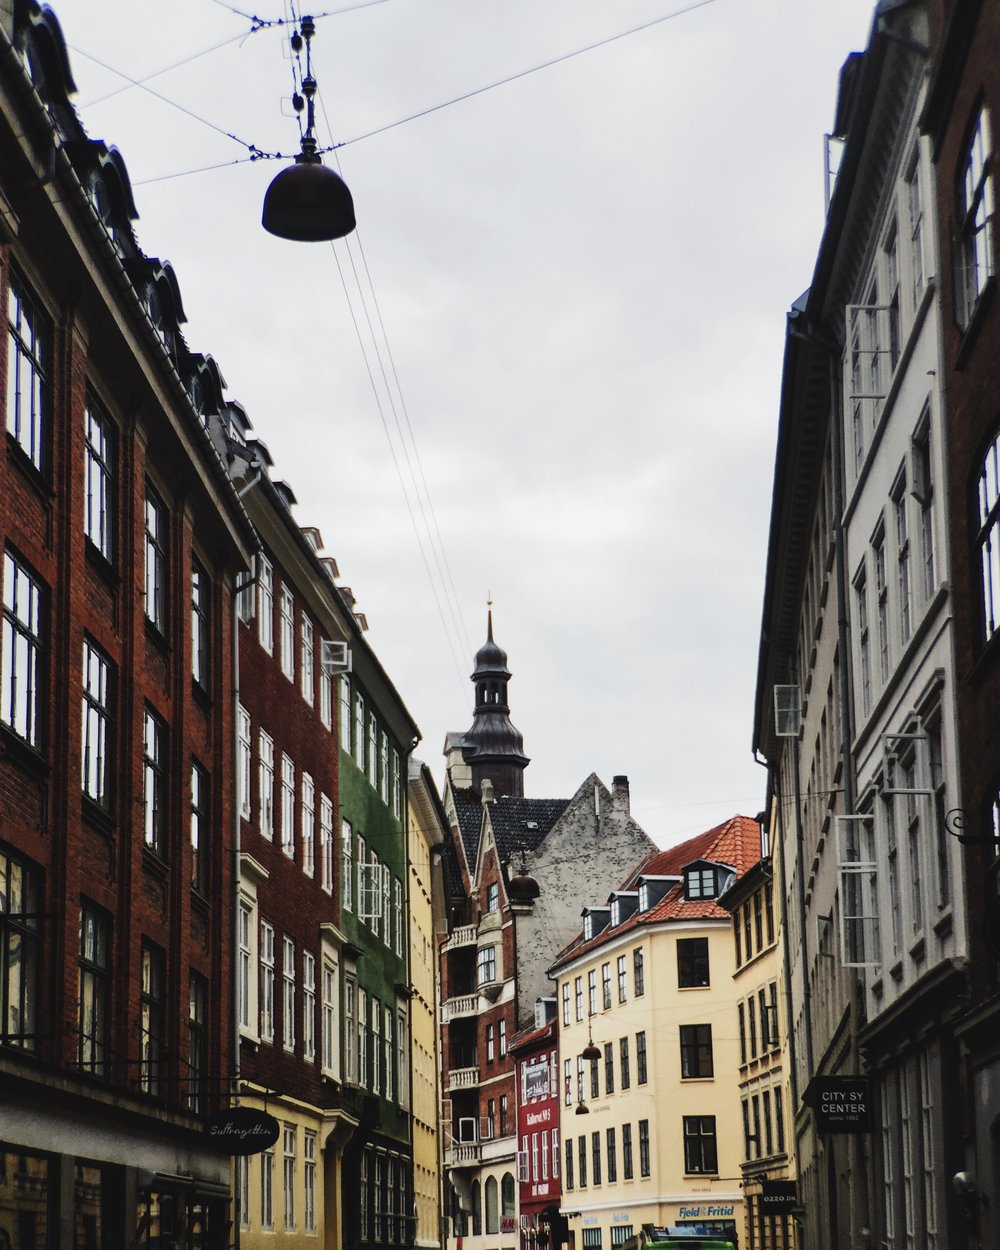 The McHowe World Tour - Norreboro Copenhagen Denmark